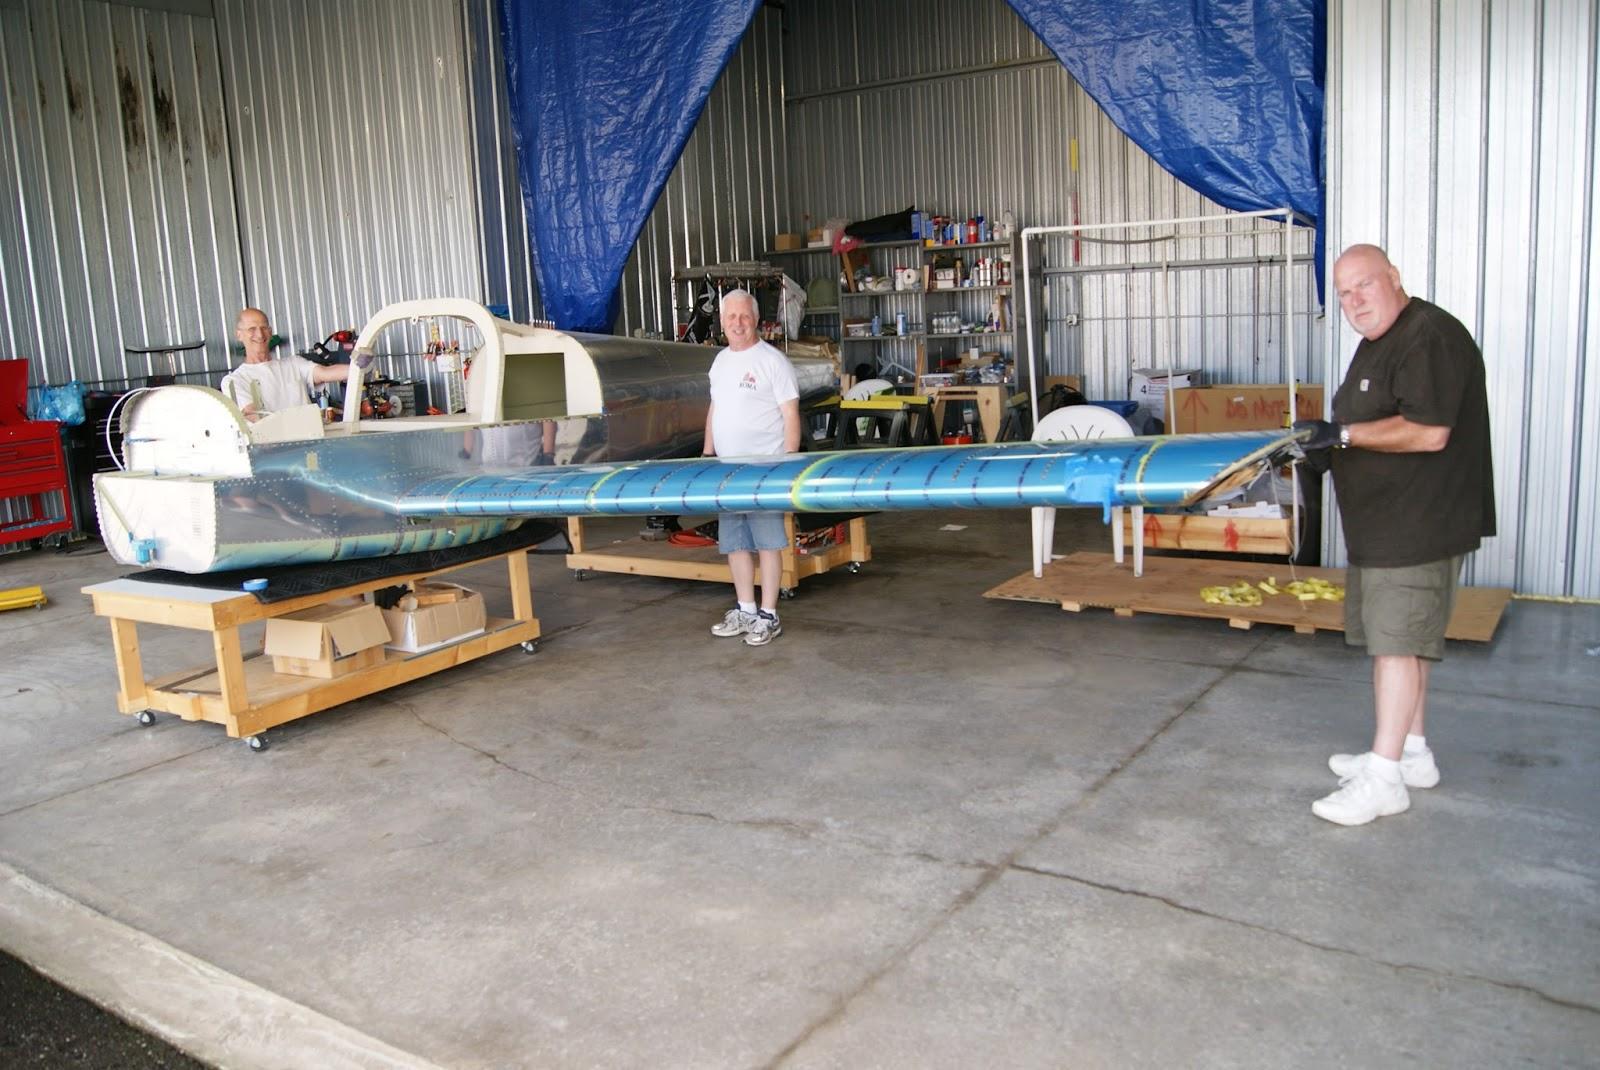 Dog Aviation John U0026 39 S Rv